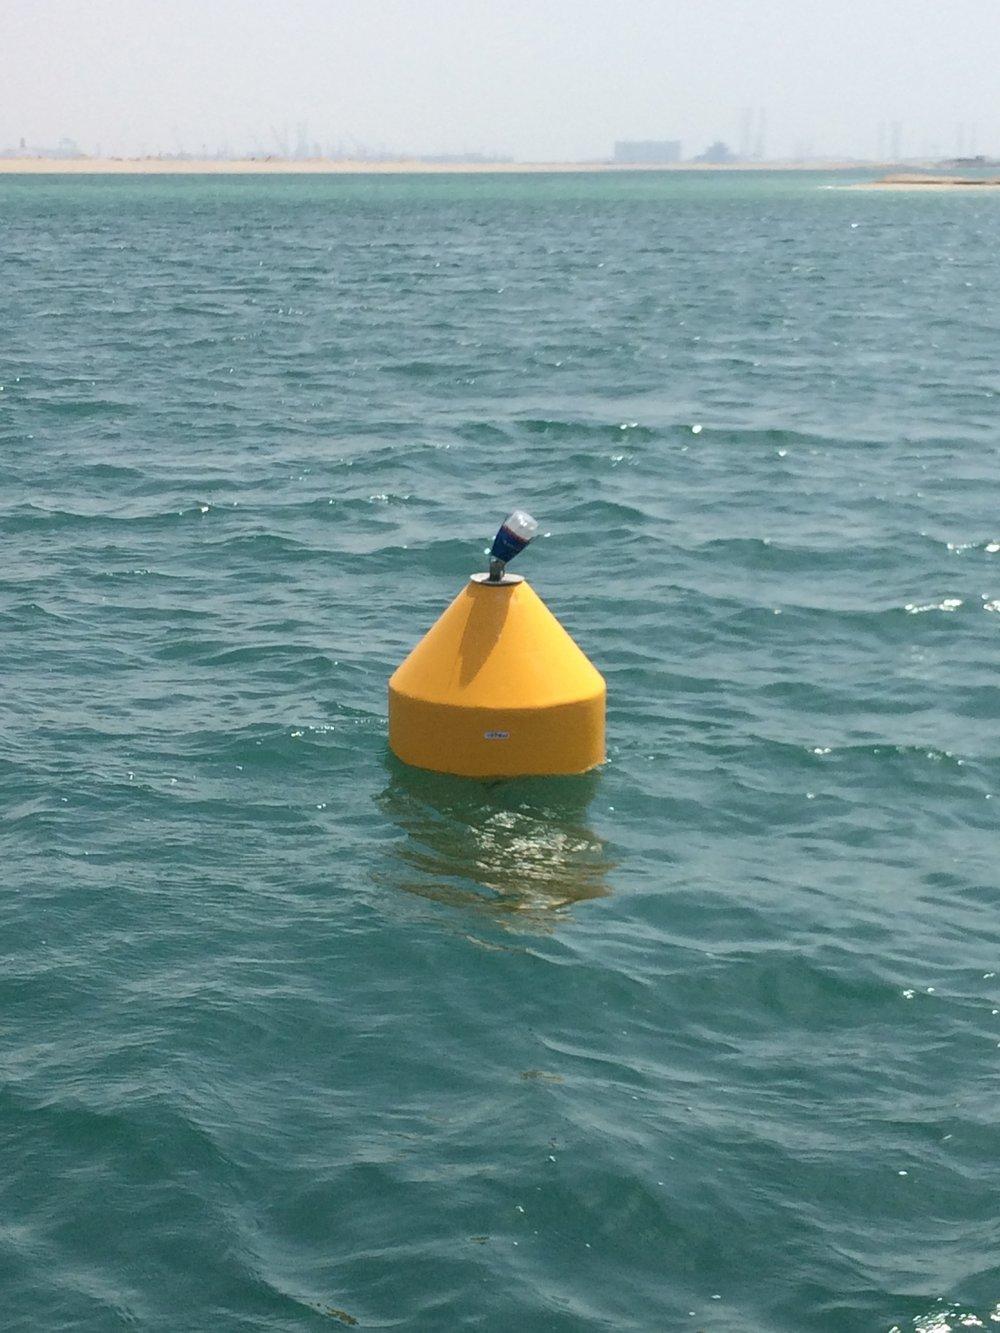 Floating Buoys - Van Oord Test - Deira Island.jpg